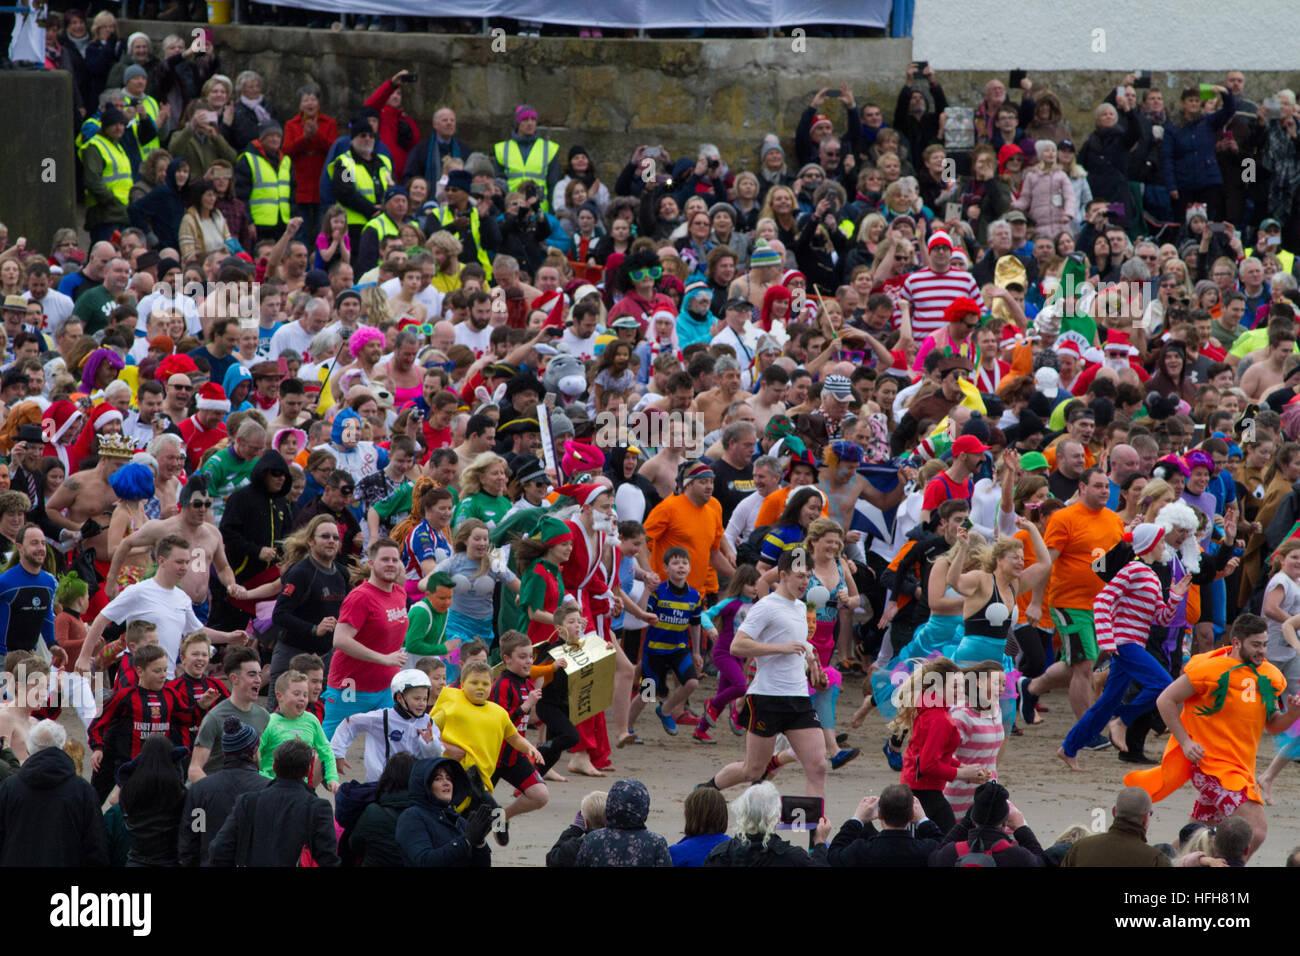 west-wales-uk-1st-january-2017-thousands